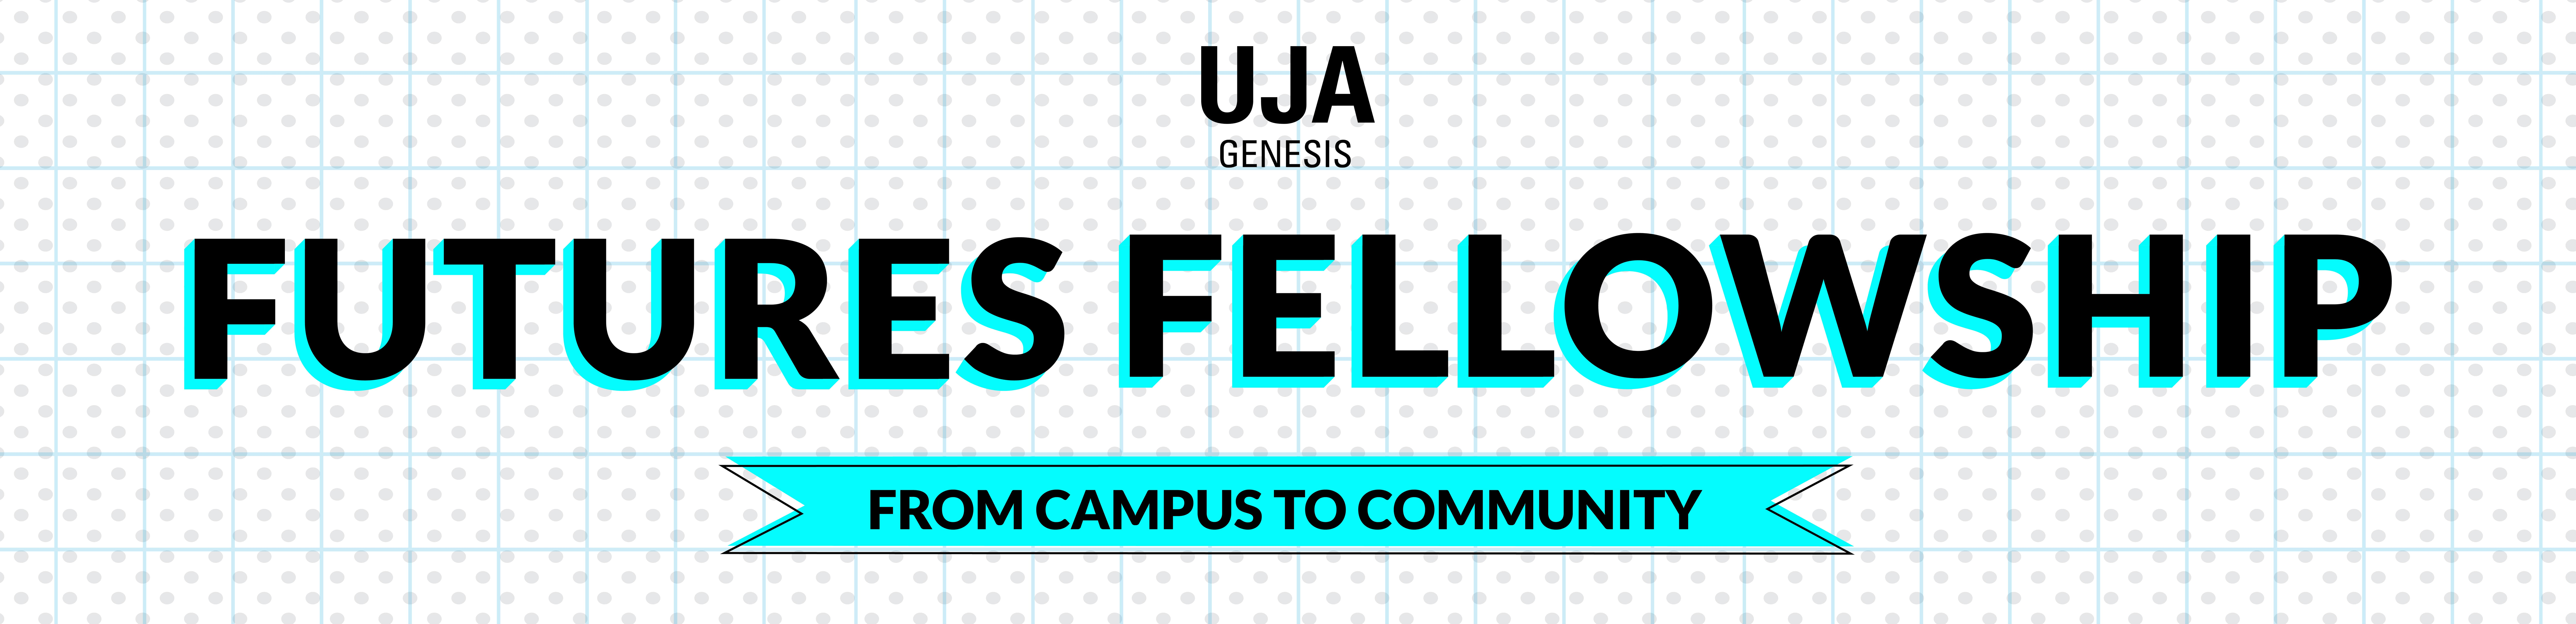 Future Fellowship